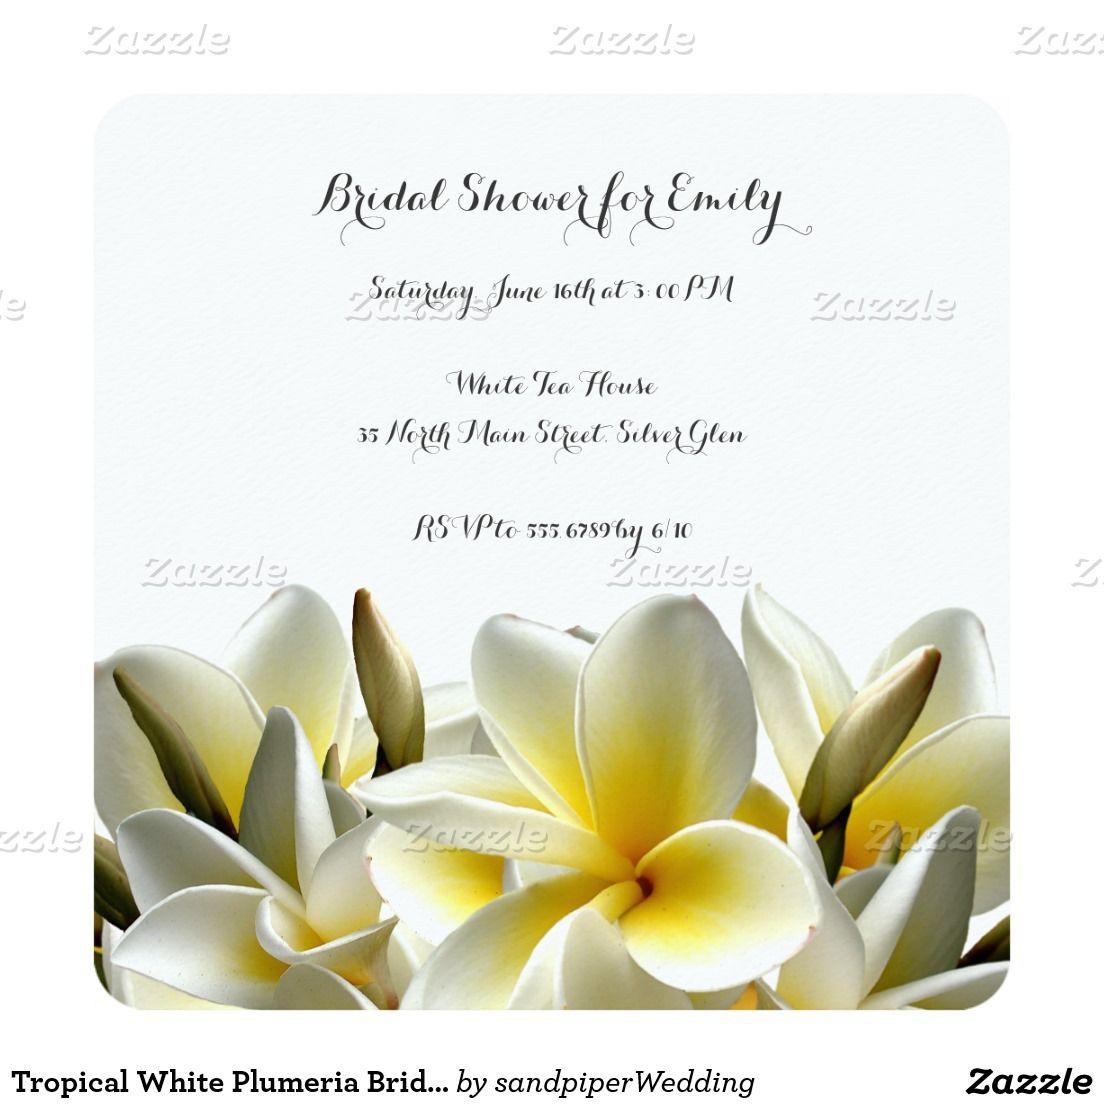 Tropical White Plumeria Bridal Shower Invitation | wedding shower ...